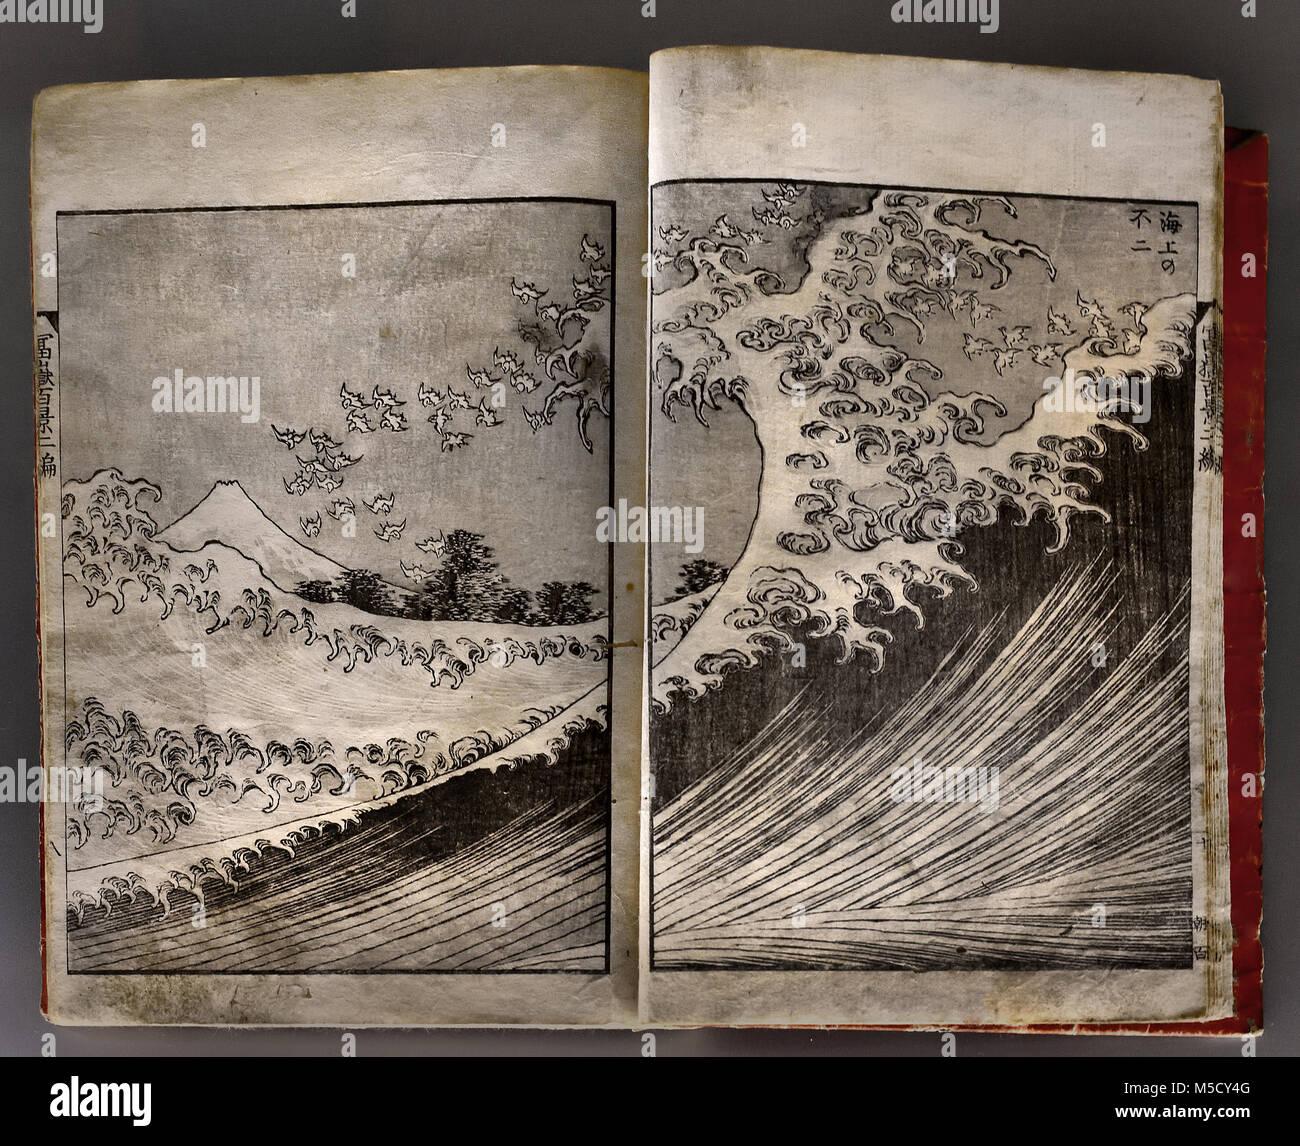 'One hundred views of Mt. Fuji - vol. II' - Illustrations  1835 Katsushika HOKUSAI (1760-1849)19th,century, - Stock Image